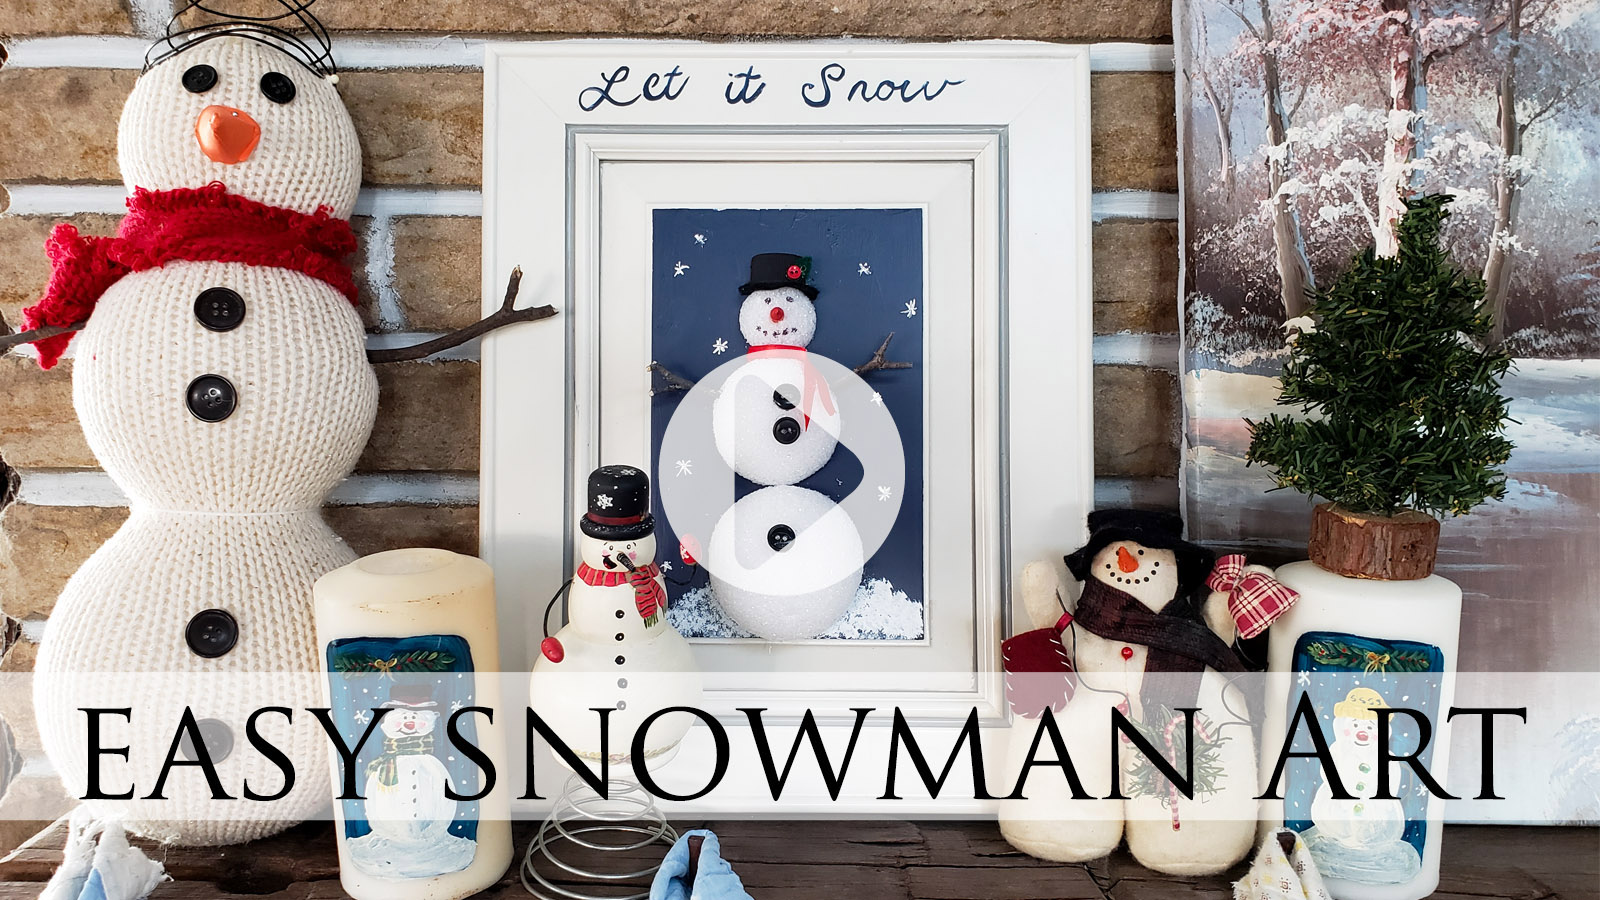 DIY Easy Snowman Art Video Tutorial by Larissa of Prodigal Pieces   prodigalpieces.com